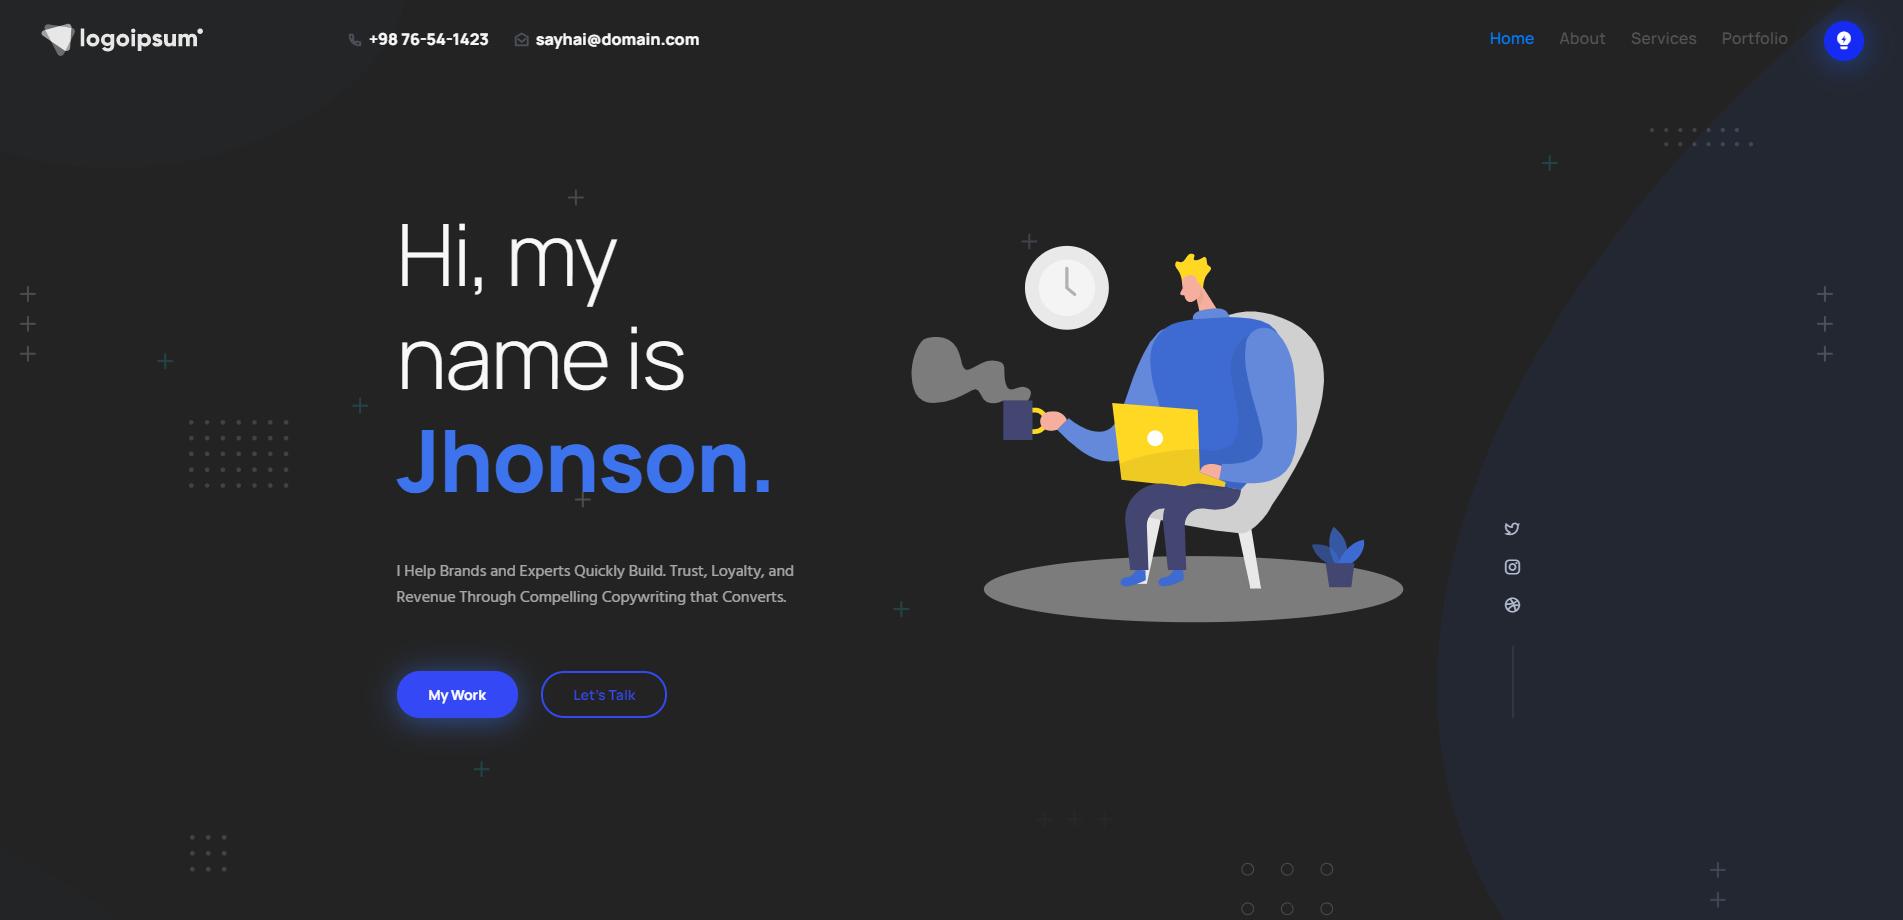 Aqous - Responsive Resume & Personal Portfolio Landing Page Template